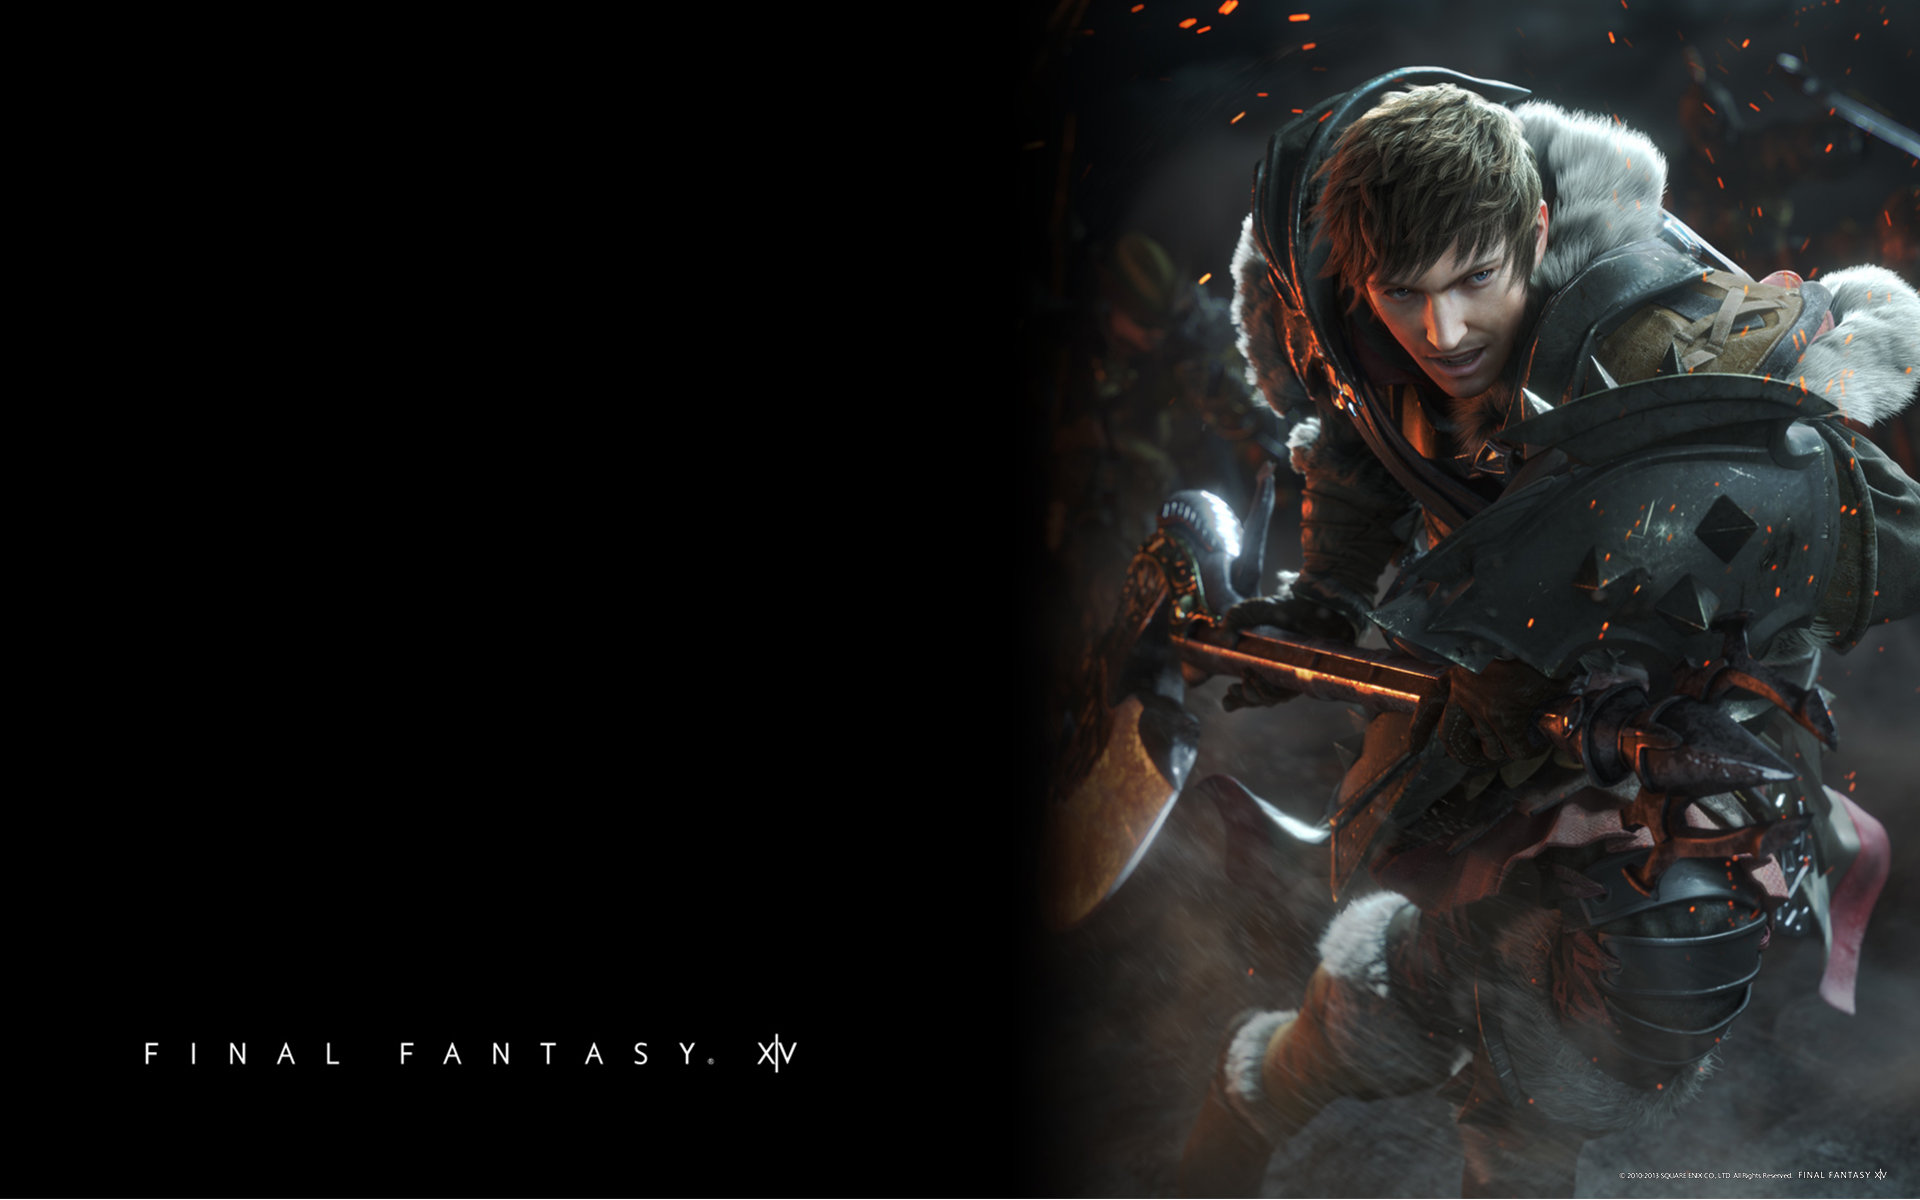 download wallpaper final fantasy 15 hd ✓ labzada wallpaper